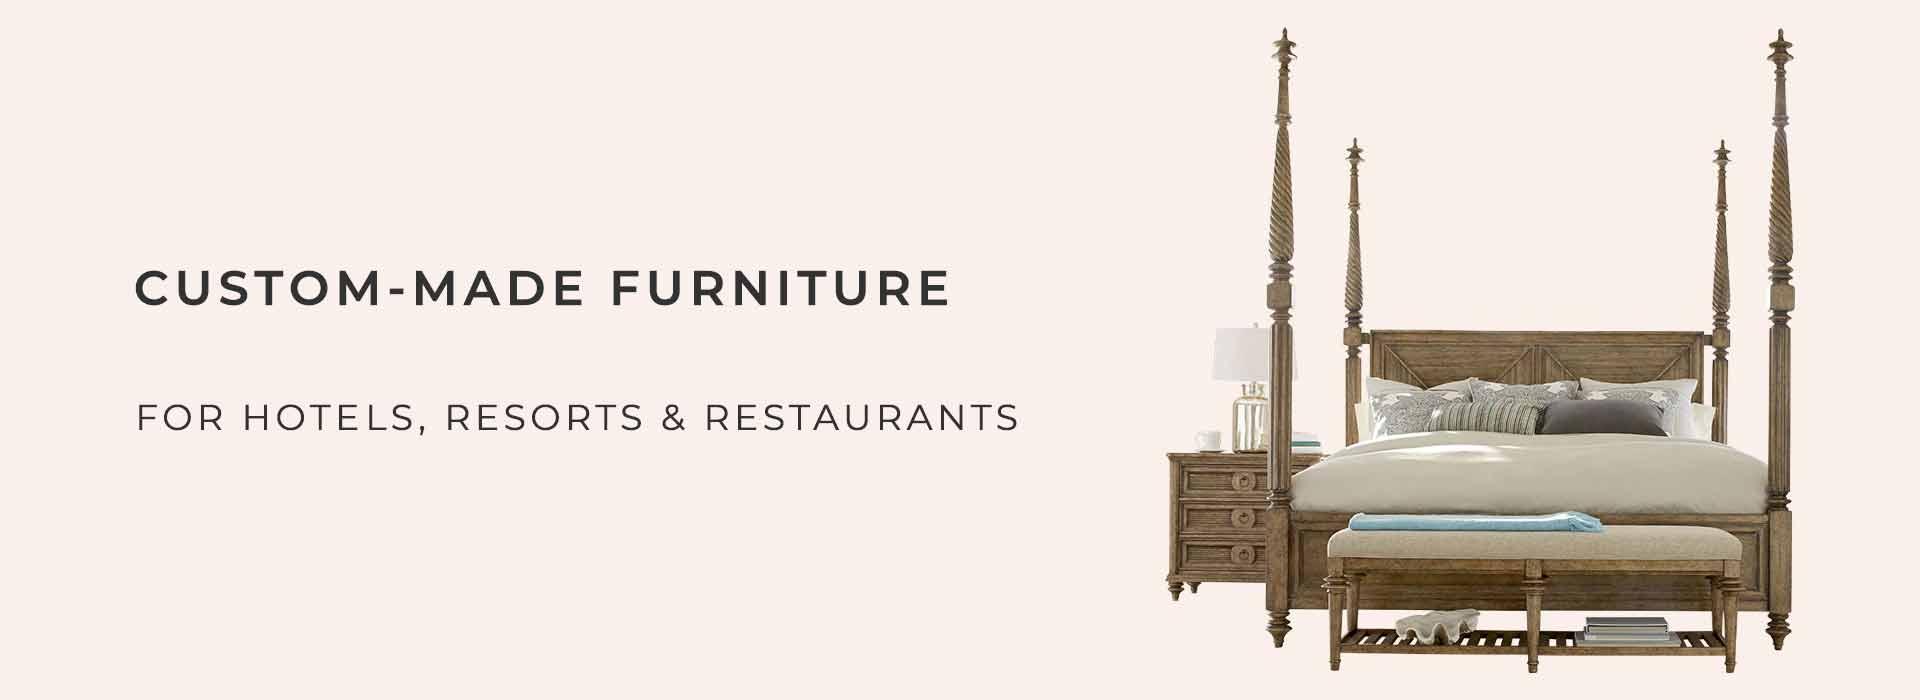 FurnitureRoots è un produttore ed esportatore di mobili per bar e caffè su misura per hotel e resort e ristoranti